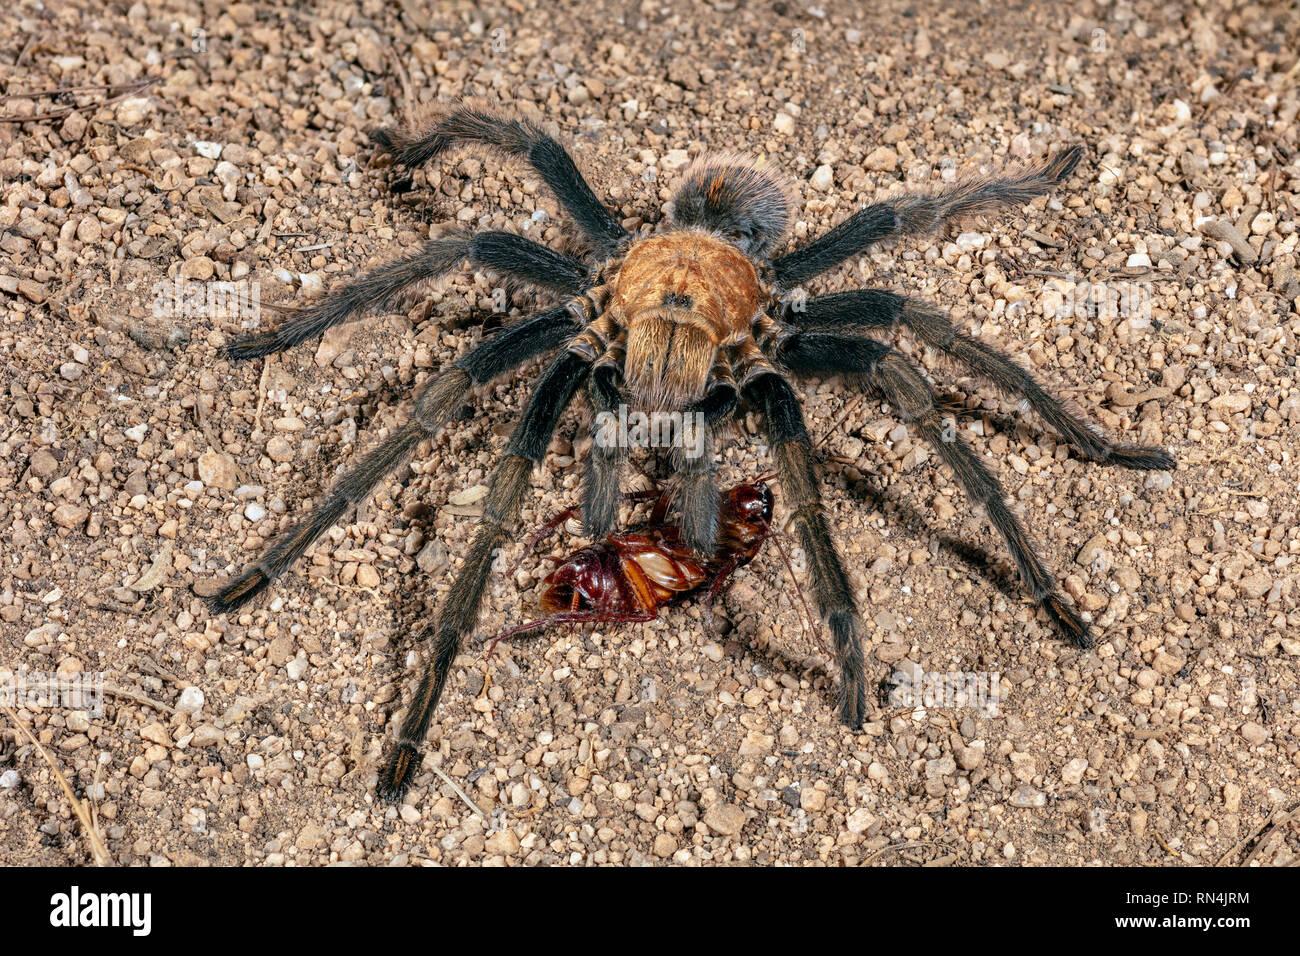 Aphonopelma Chalcodes Or The Western Desert Tarantula Arizona Blond Tarantula Or Mexican Blond Tarantula About 5 Across Stock Photo Alamy